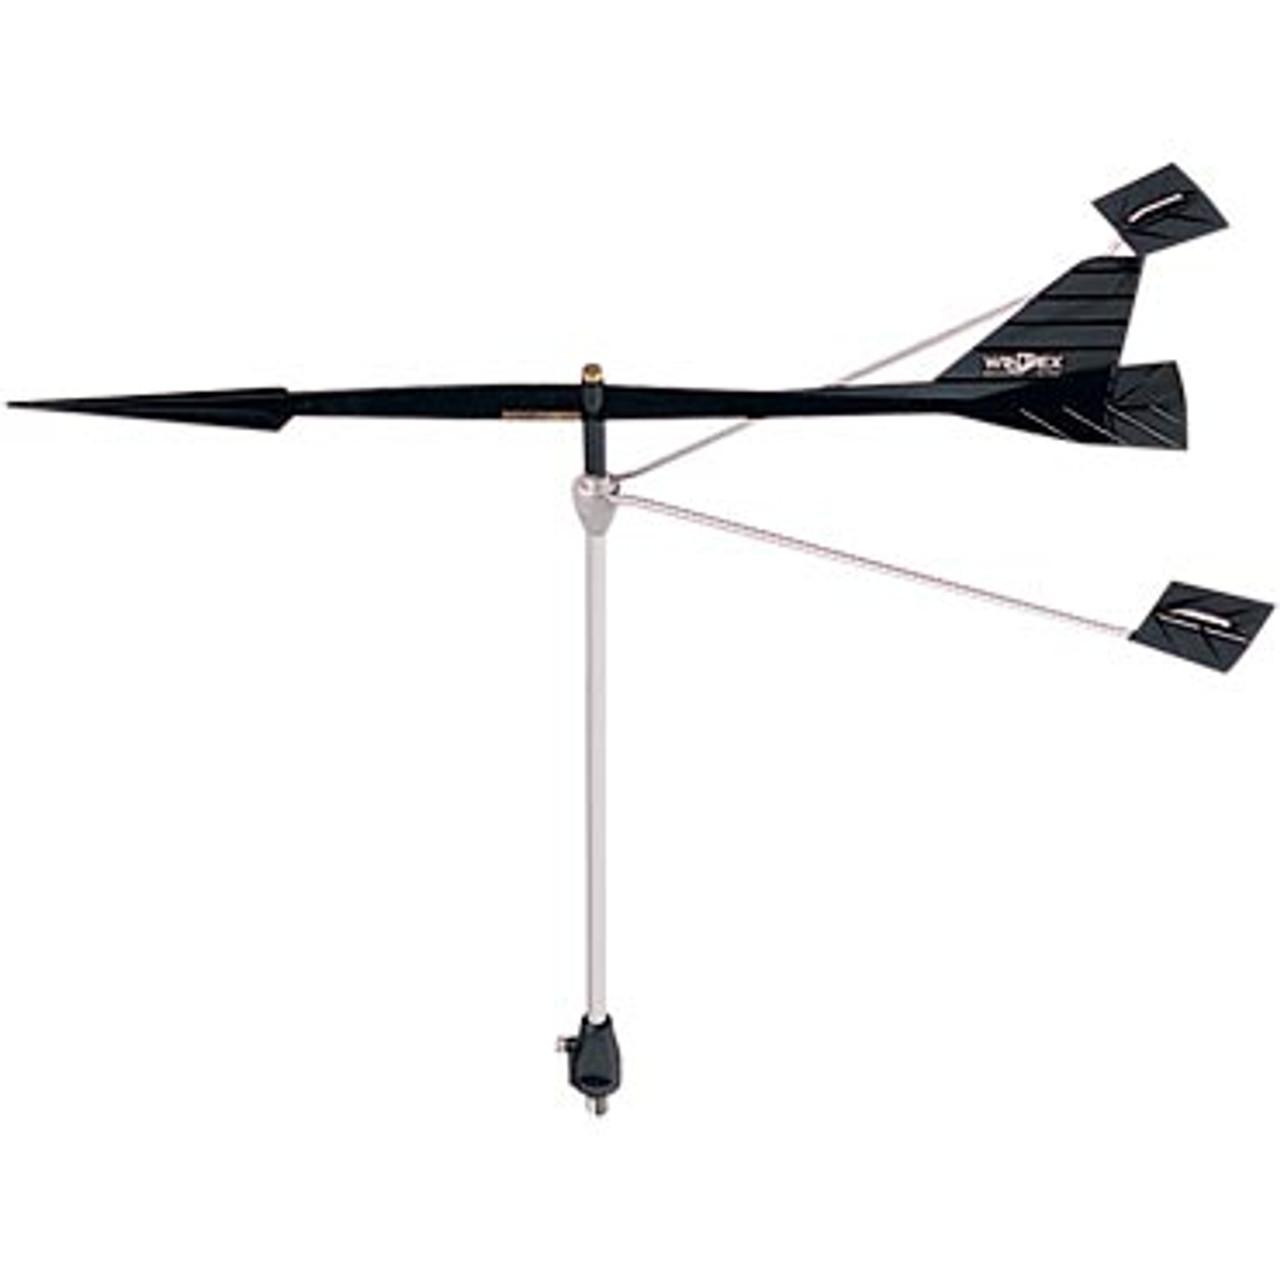 Windex - Large 380mm